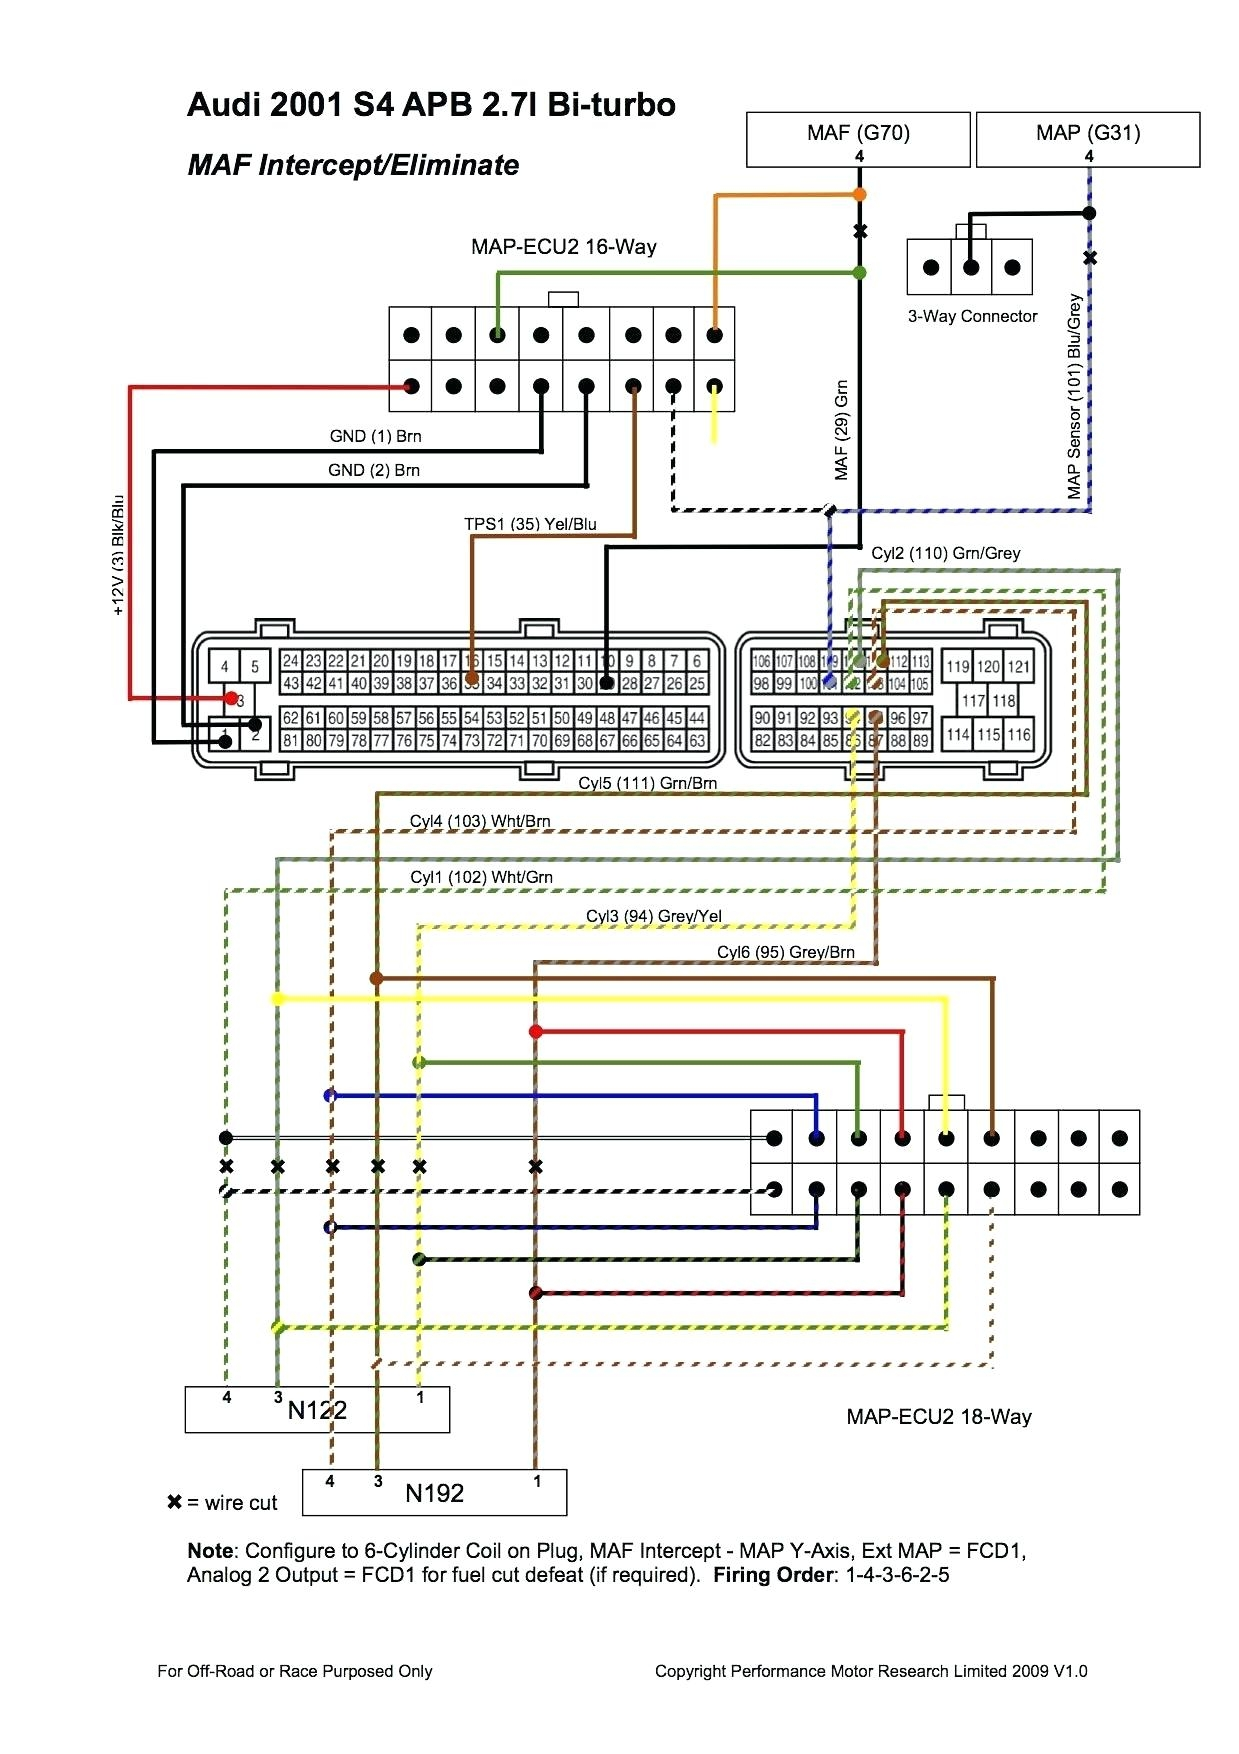 2002 dodge caravan wiring diagram - wiring diagram also 2004 dodge grand caravan  wiring diagram moreover